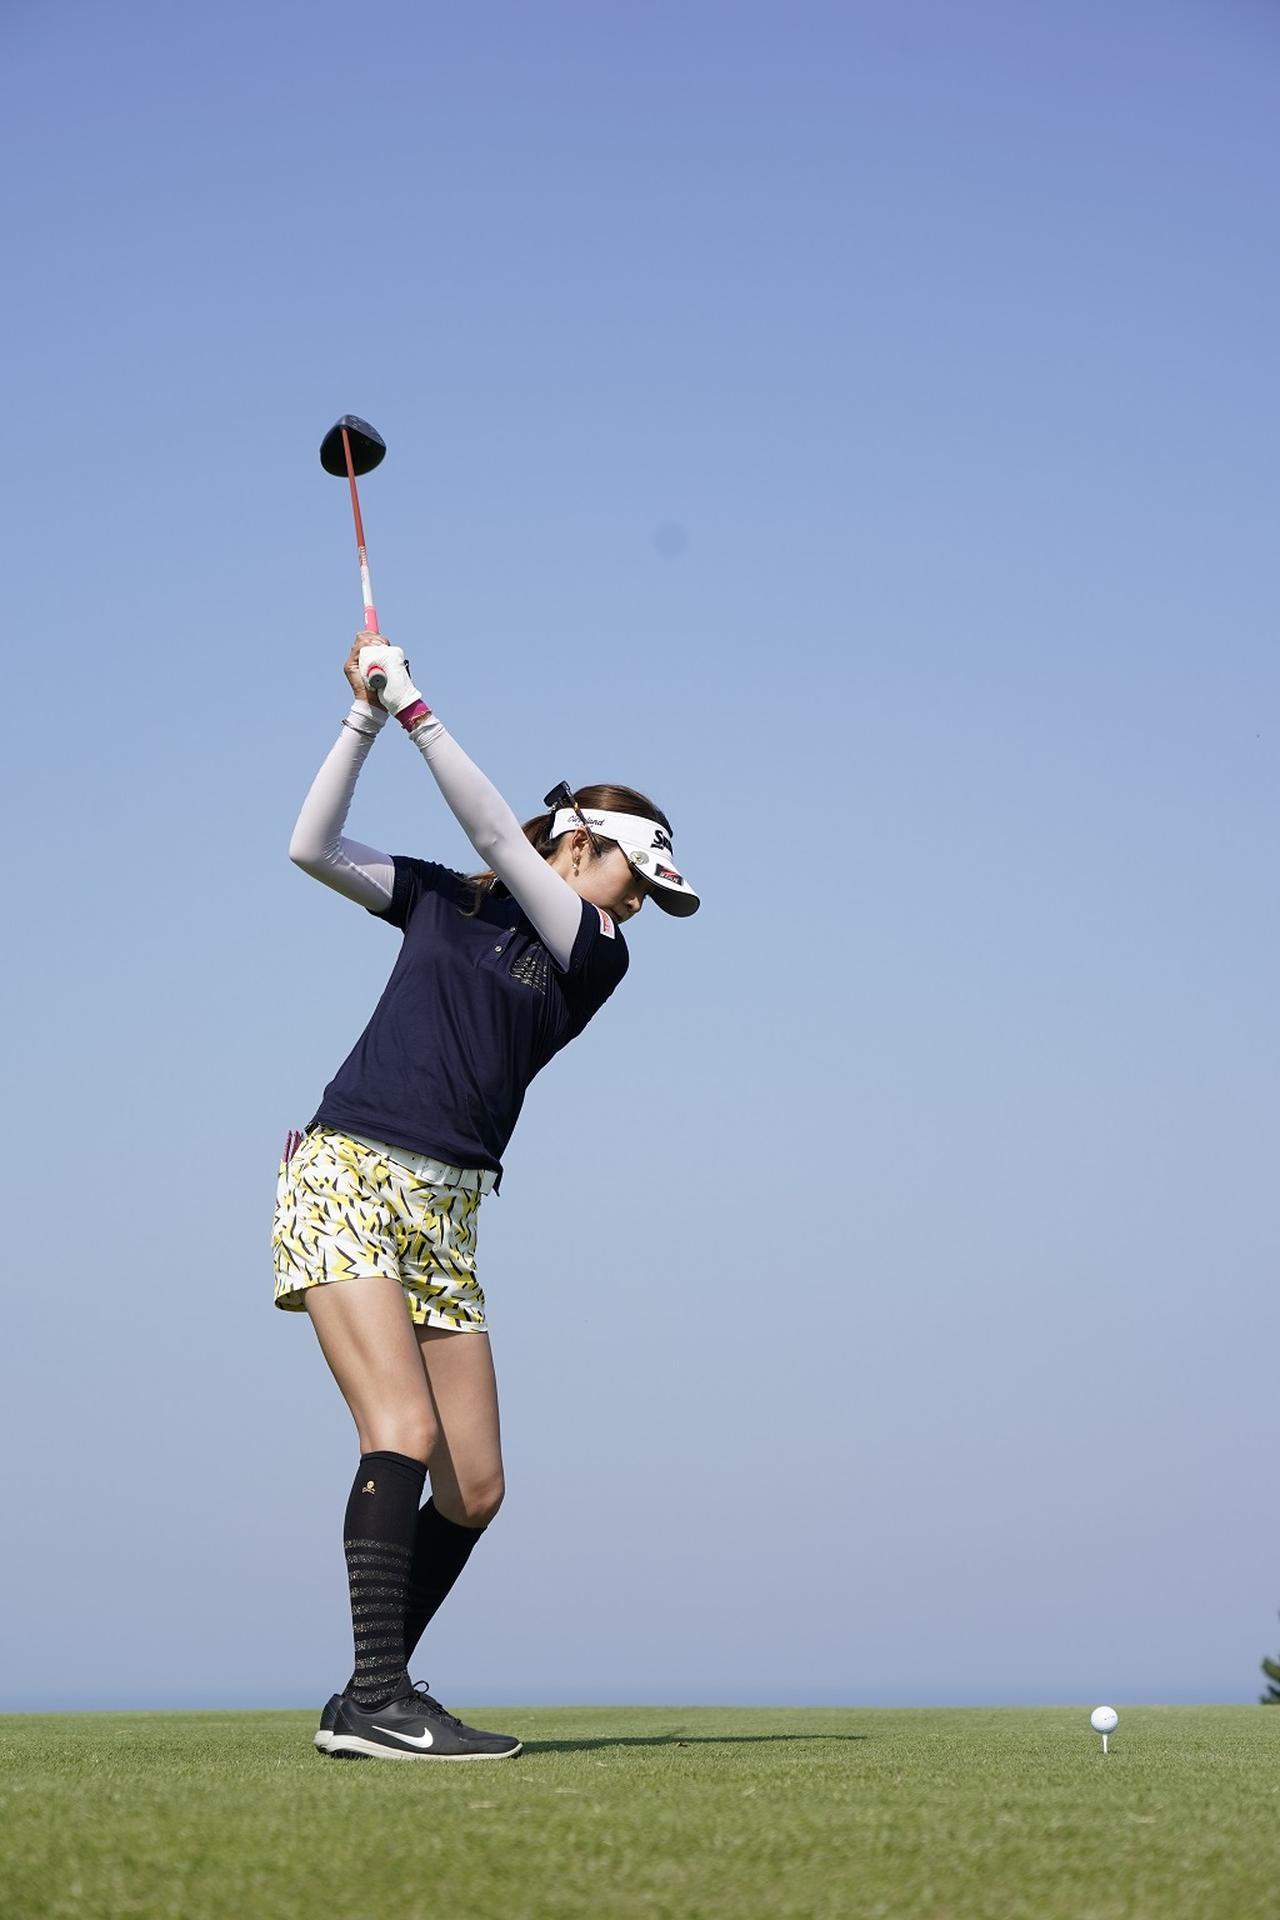 Images : 4番目の画像 - 金田久美子ドライバー後方連続写真 - みんなのゴルフダイジェスト